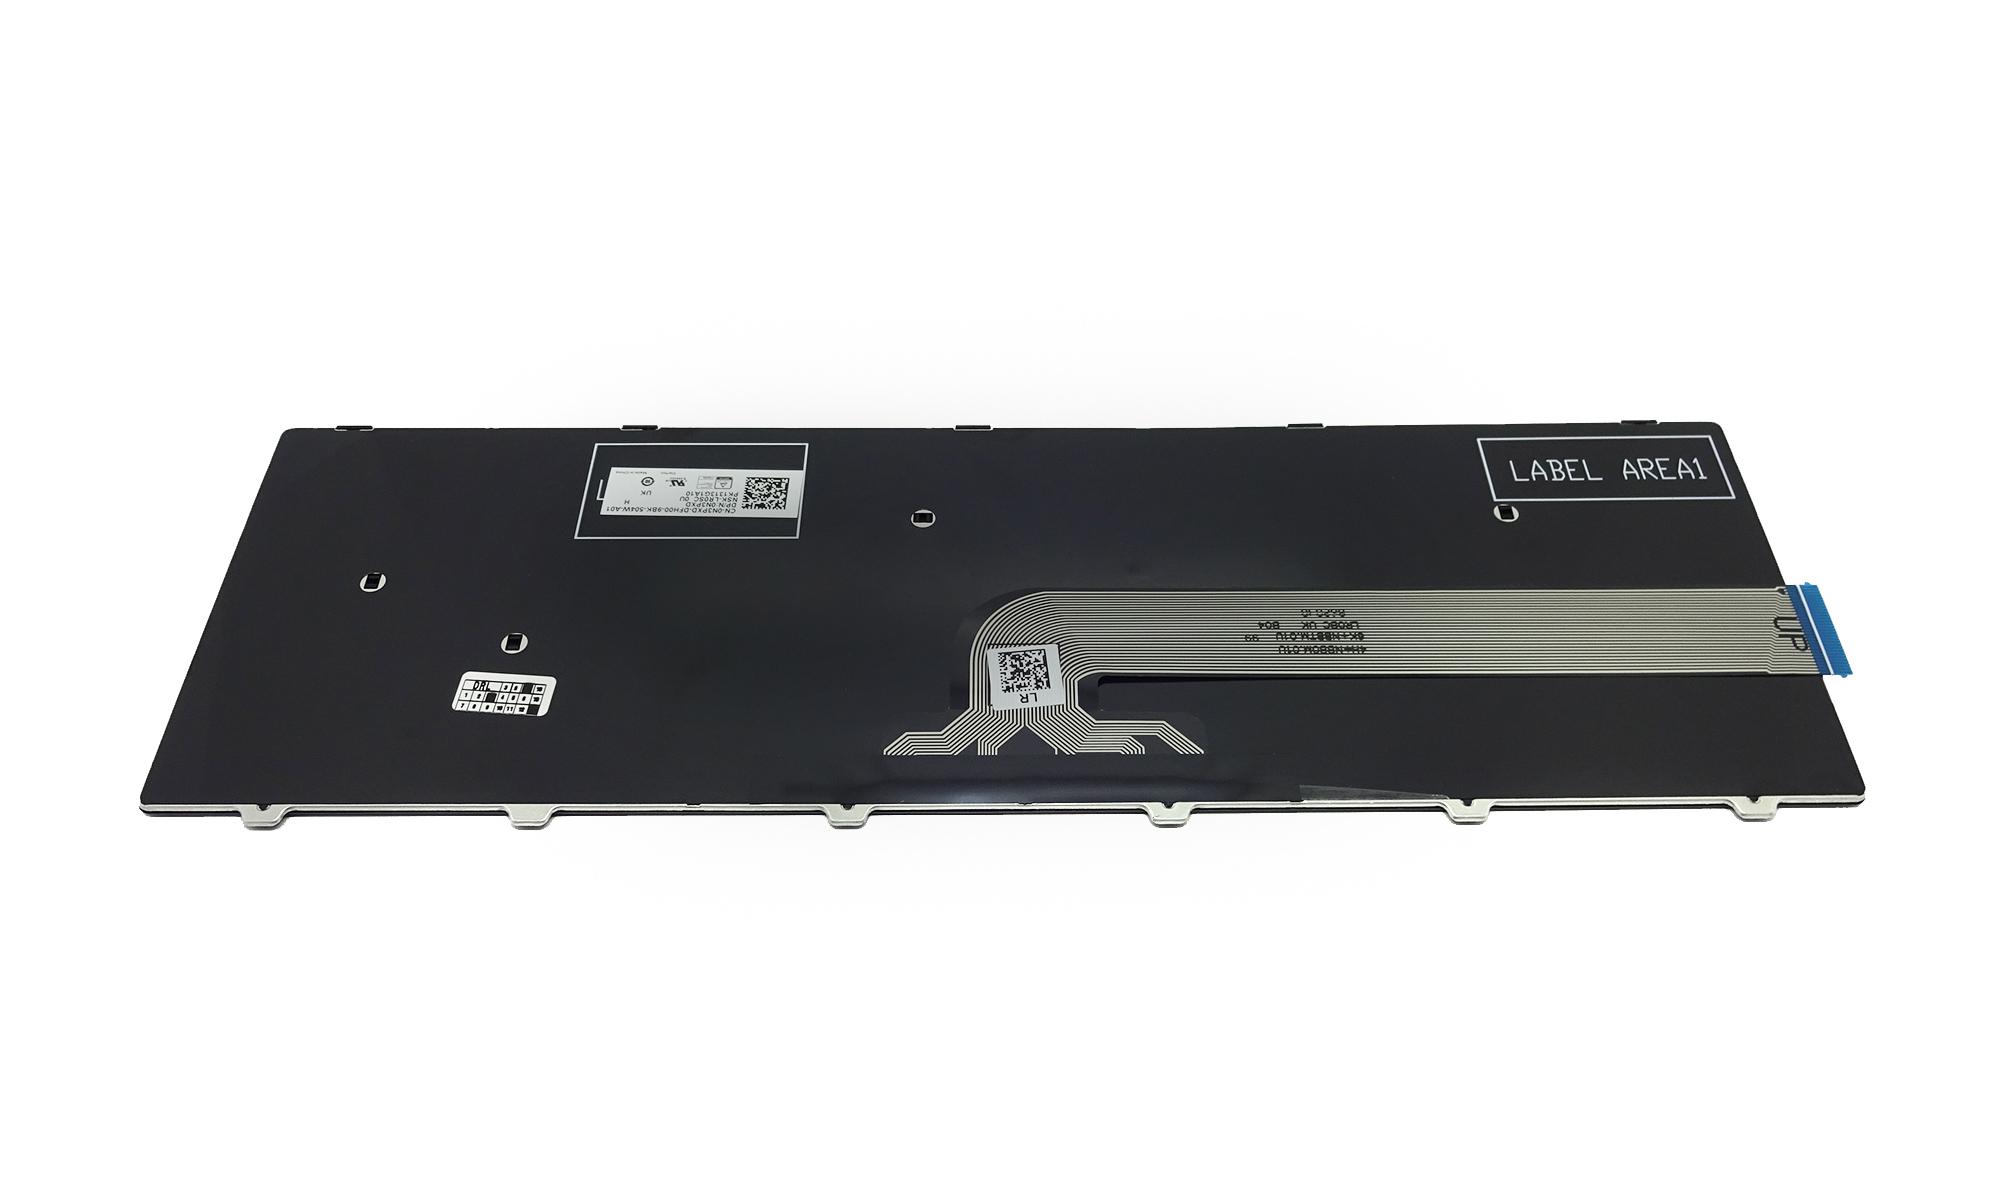 Tastatura originala Dell Inspiron 5758, 5759, 7557, 7559, neagra, fara iluminare, layout UK, model N3PXD